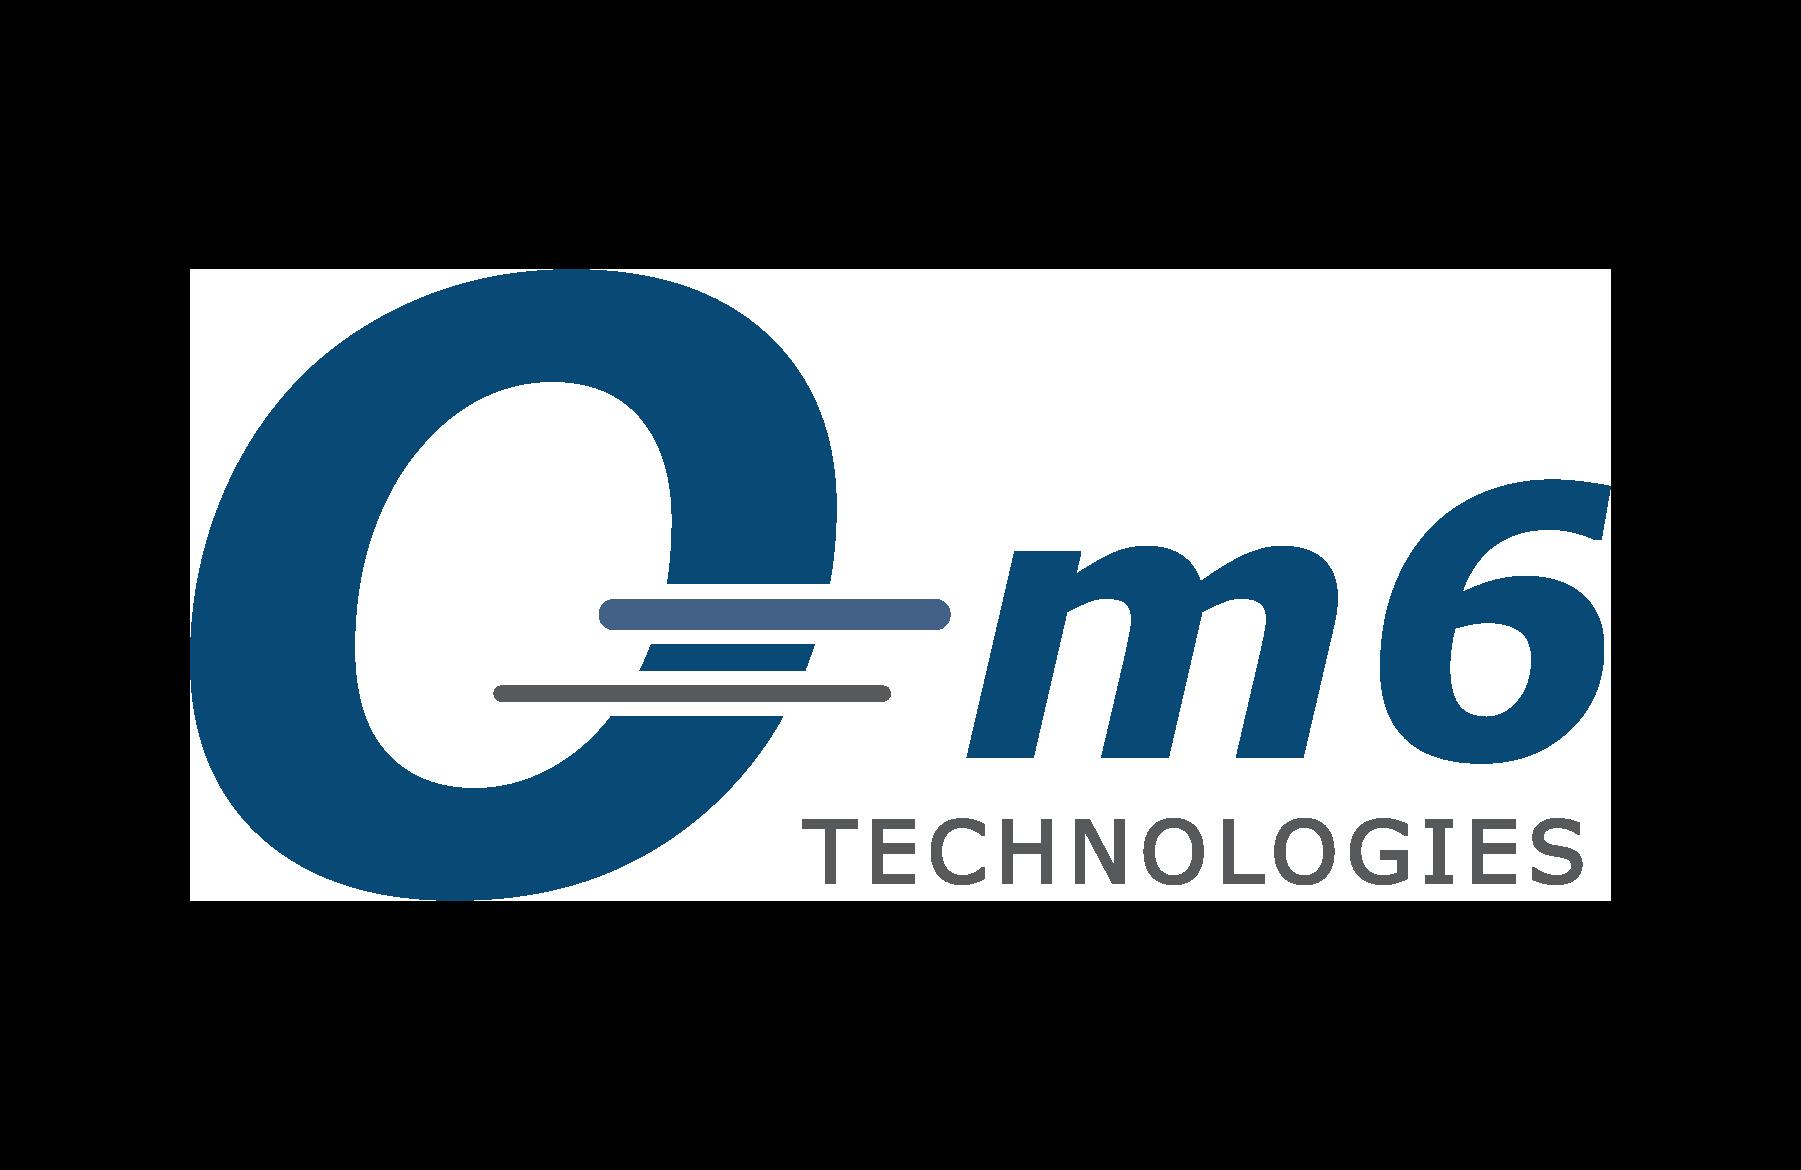 O-m6 Technologies